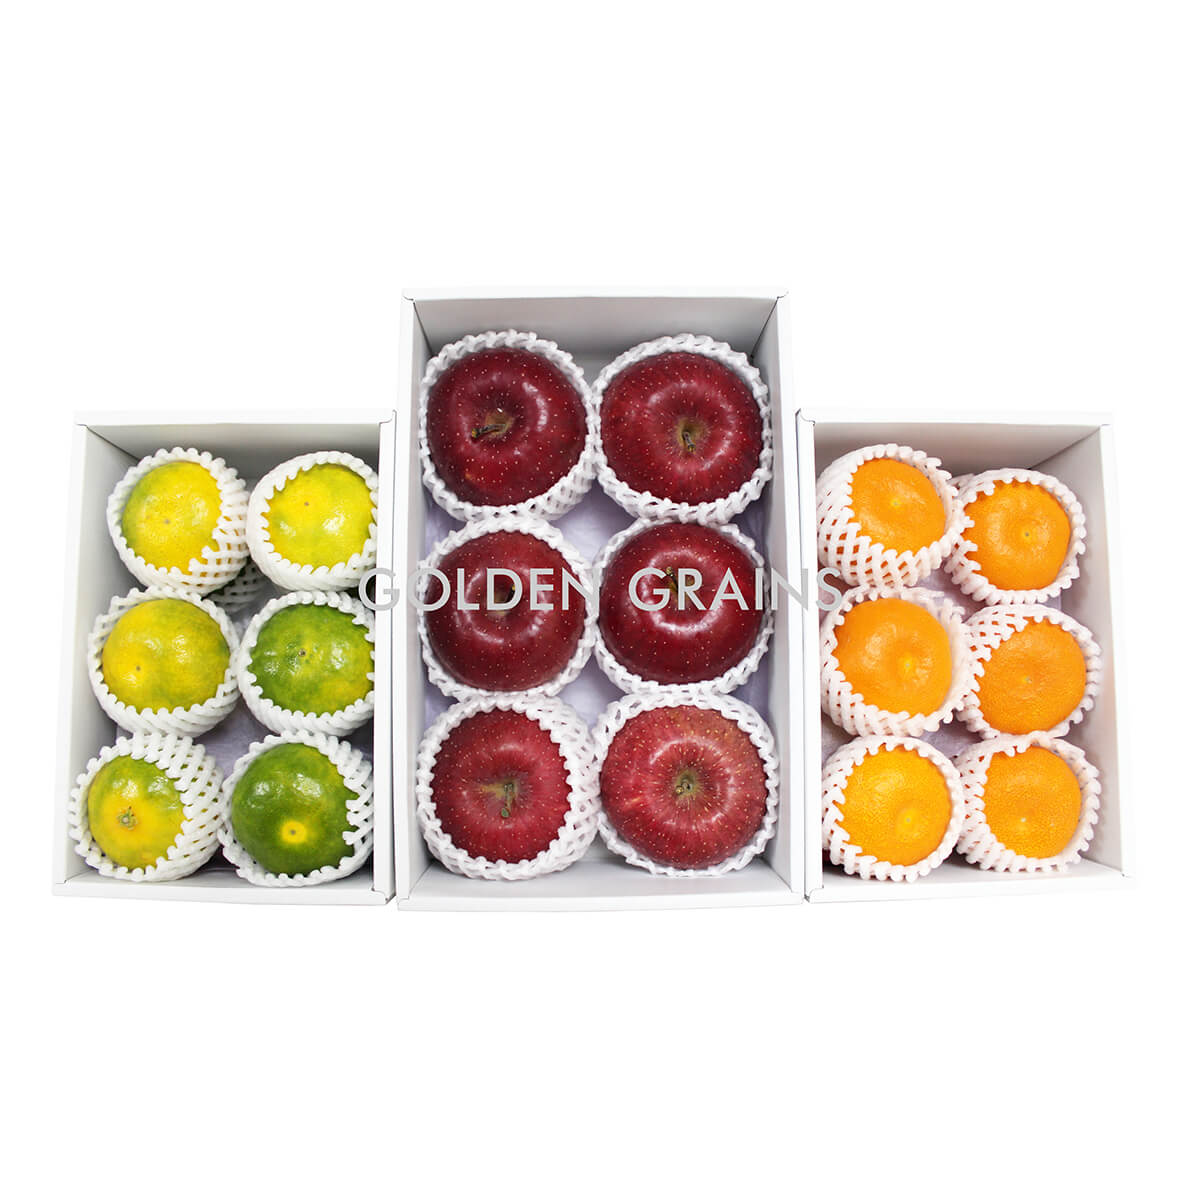 Golden Grains - Japan Fresh Fruits - 3 Boxes.jpg